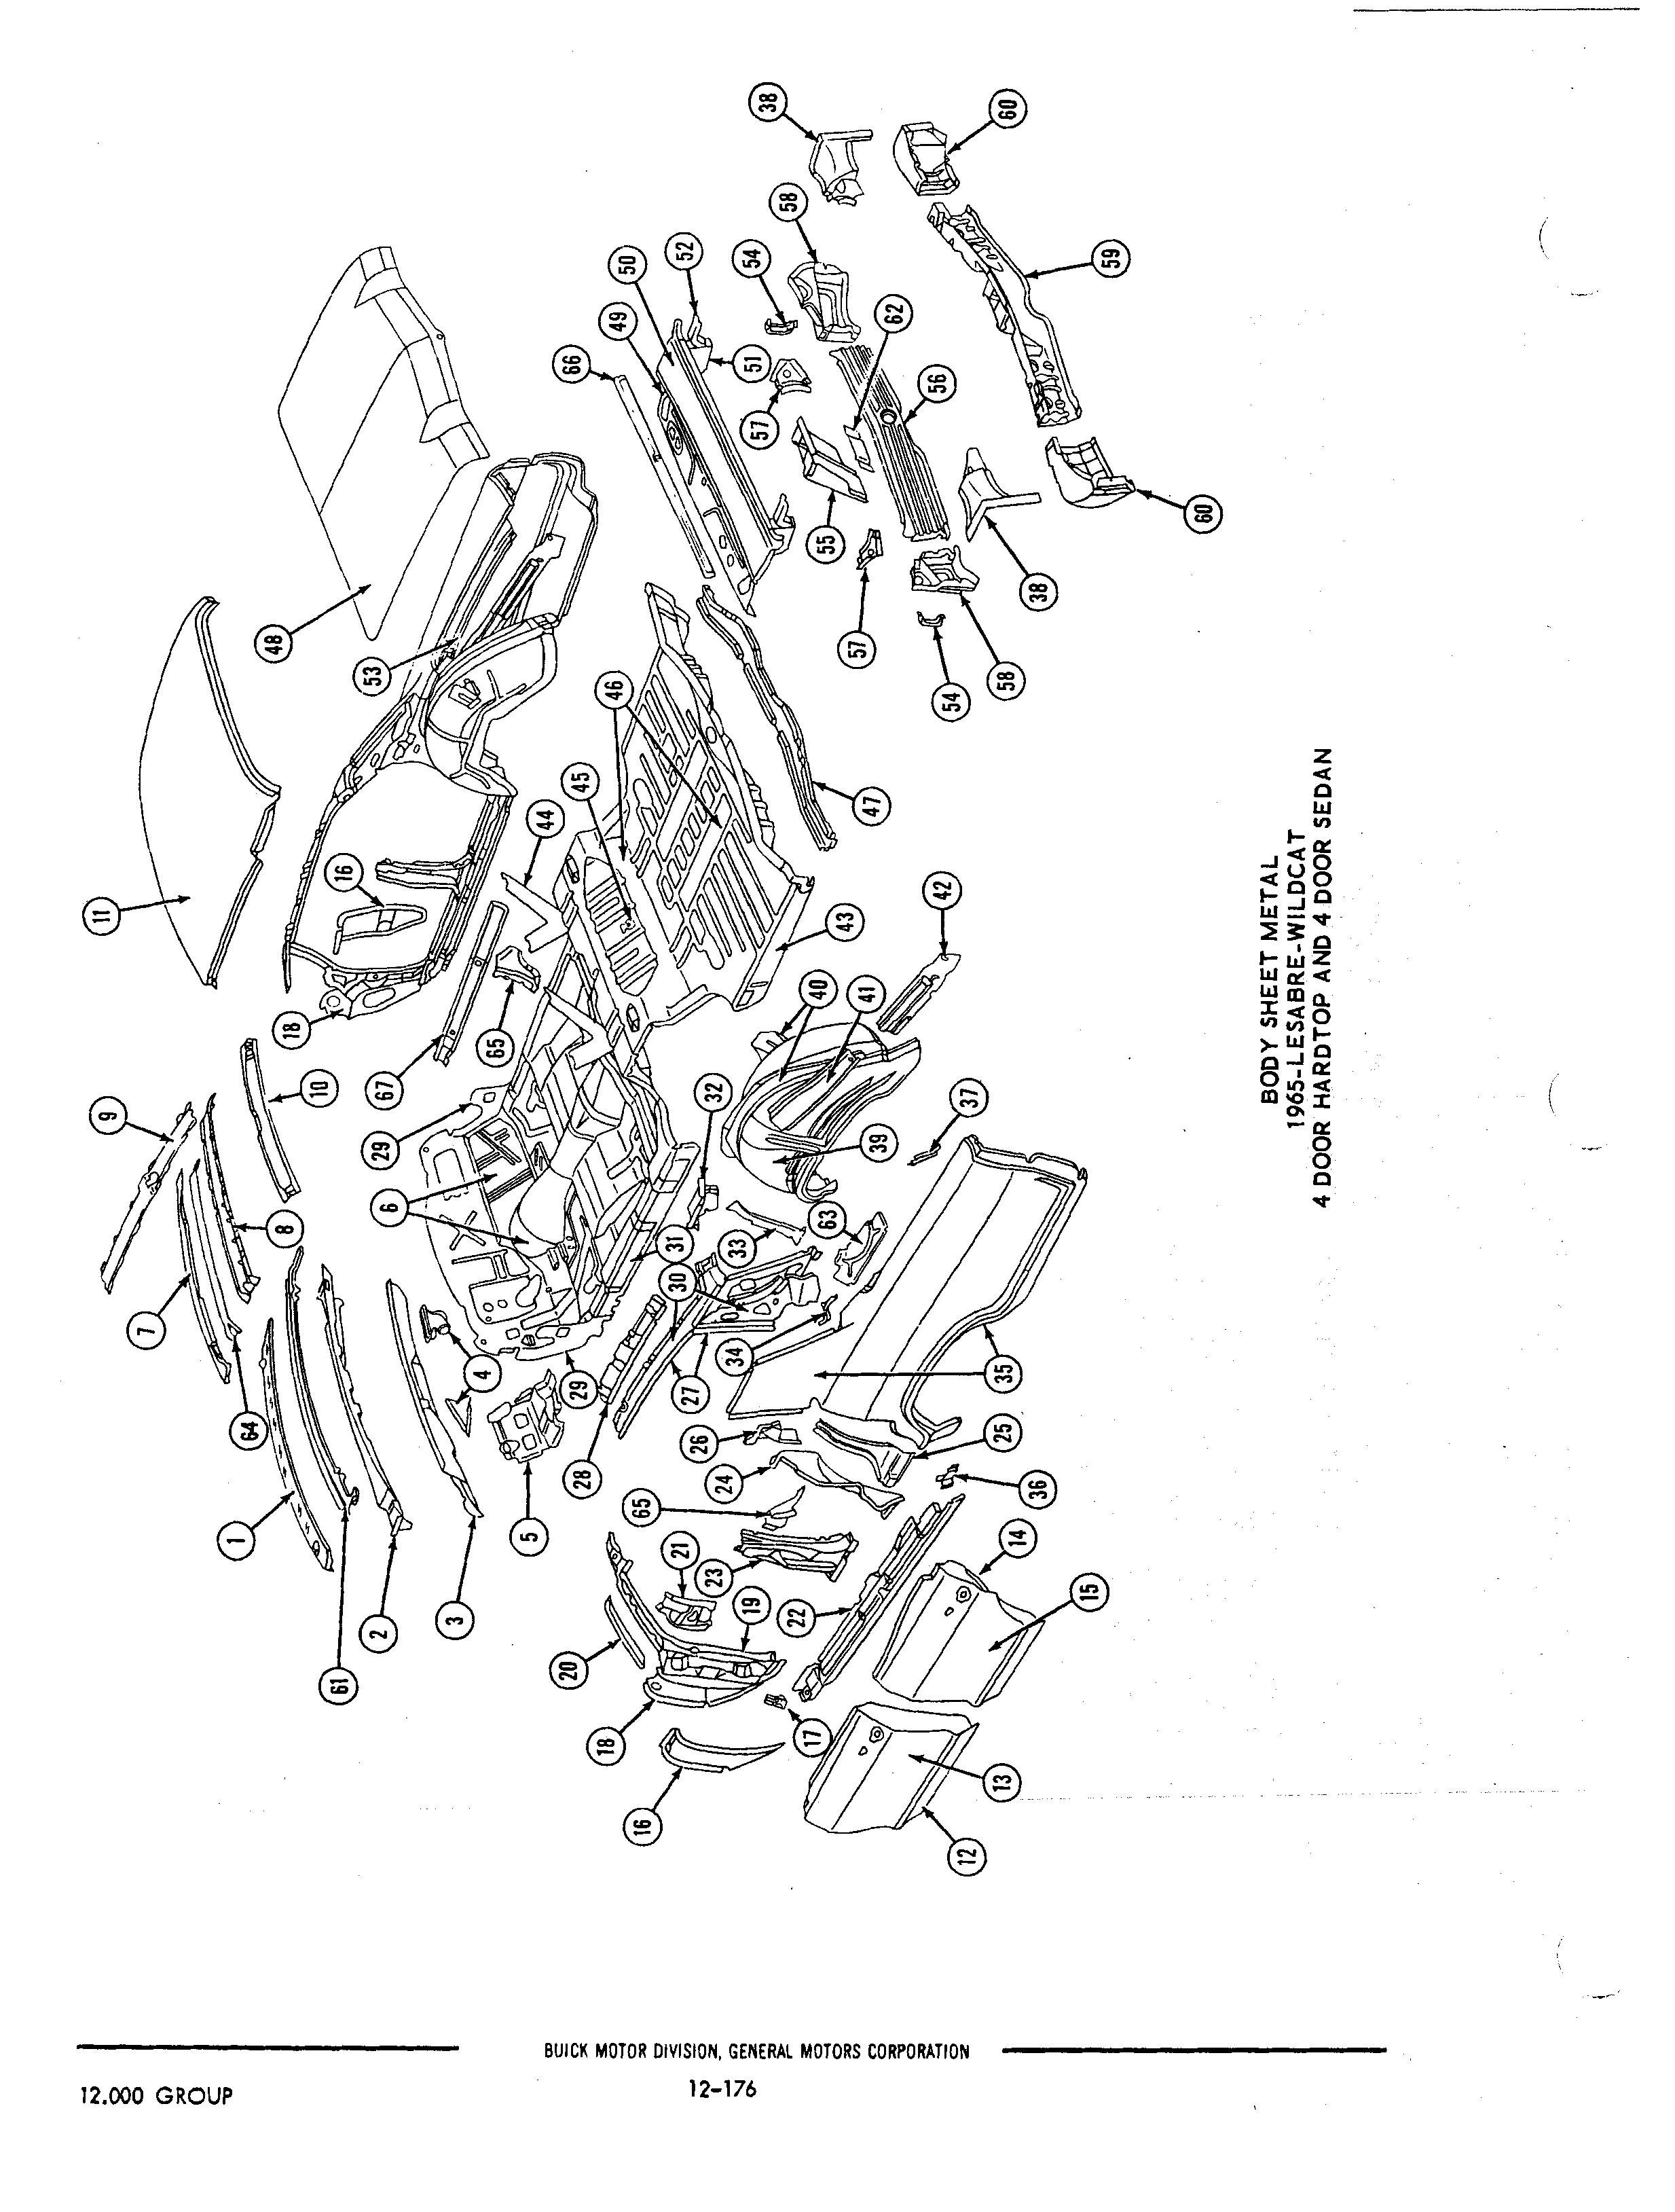 buick parts catalog